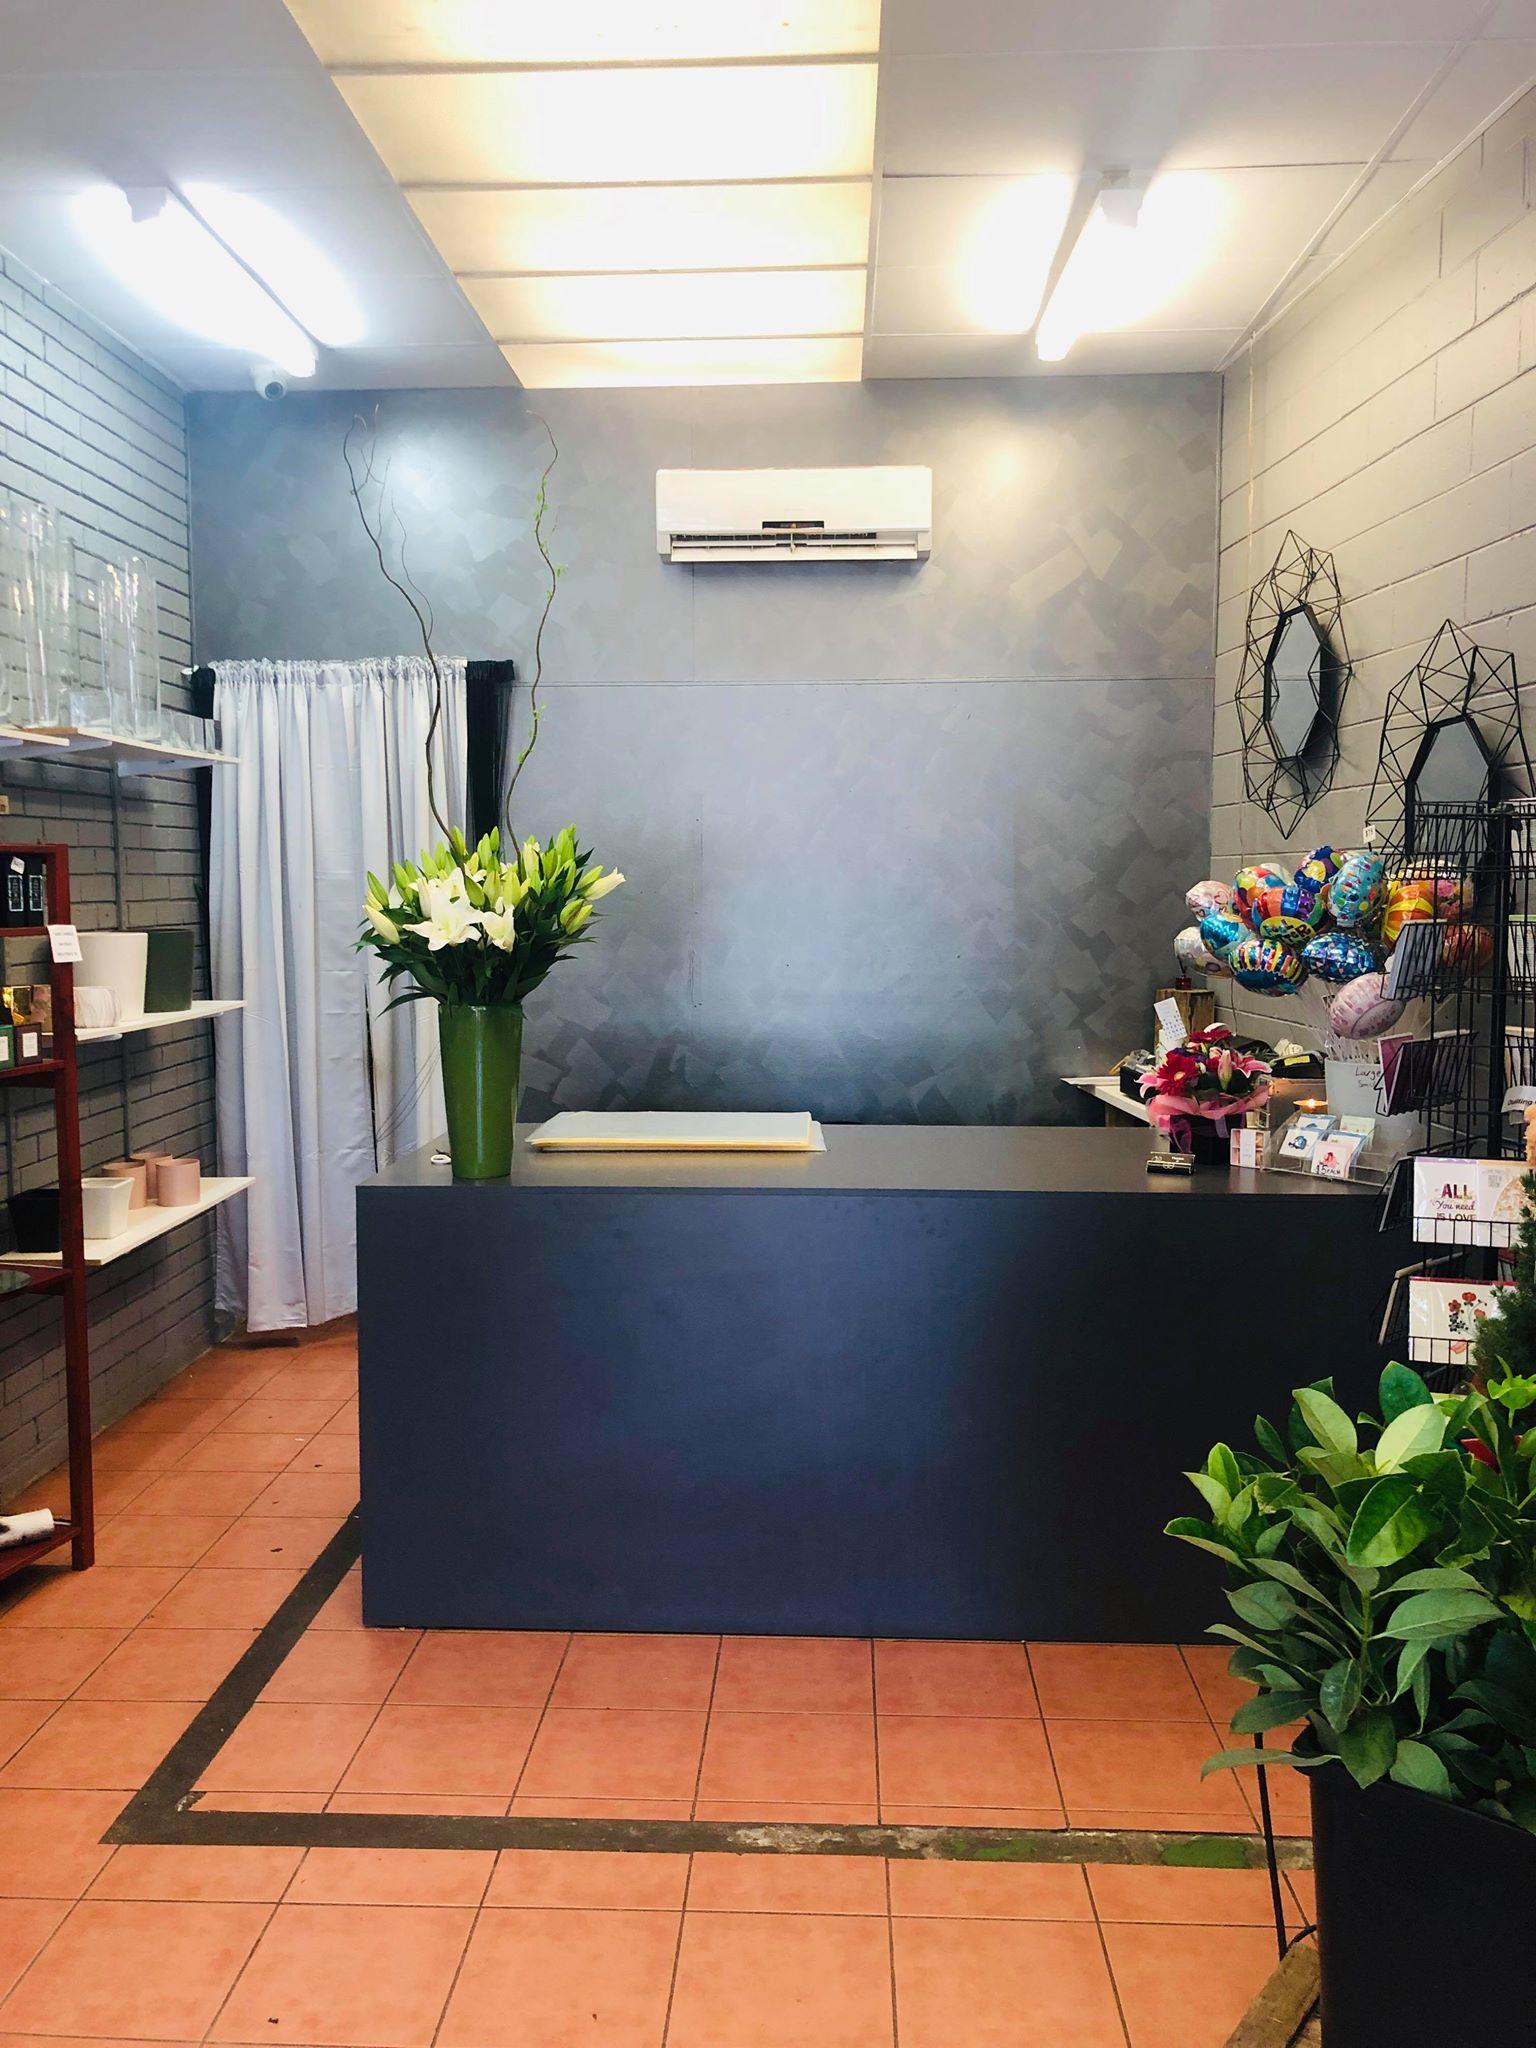 florist-mw1035-5